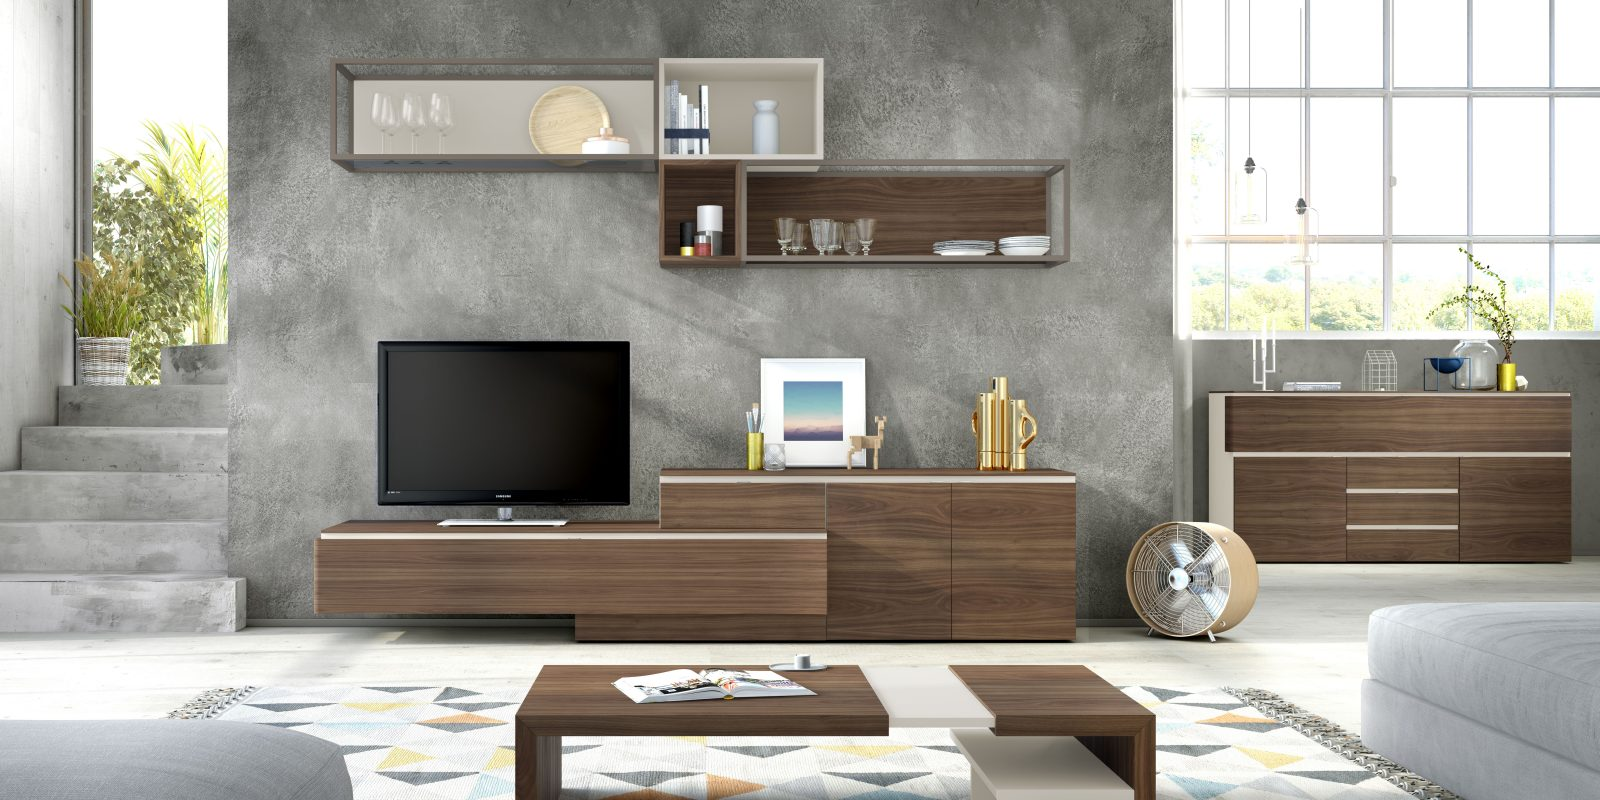 Sal n modular up mobiliario hd - Salones aqualandia valencia ...